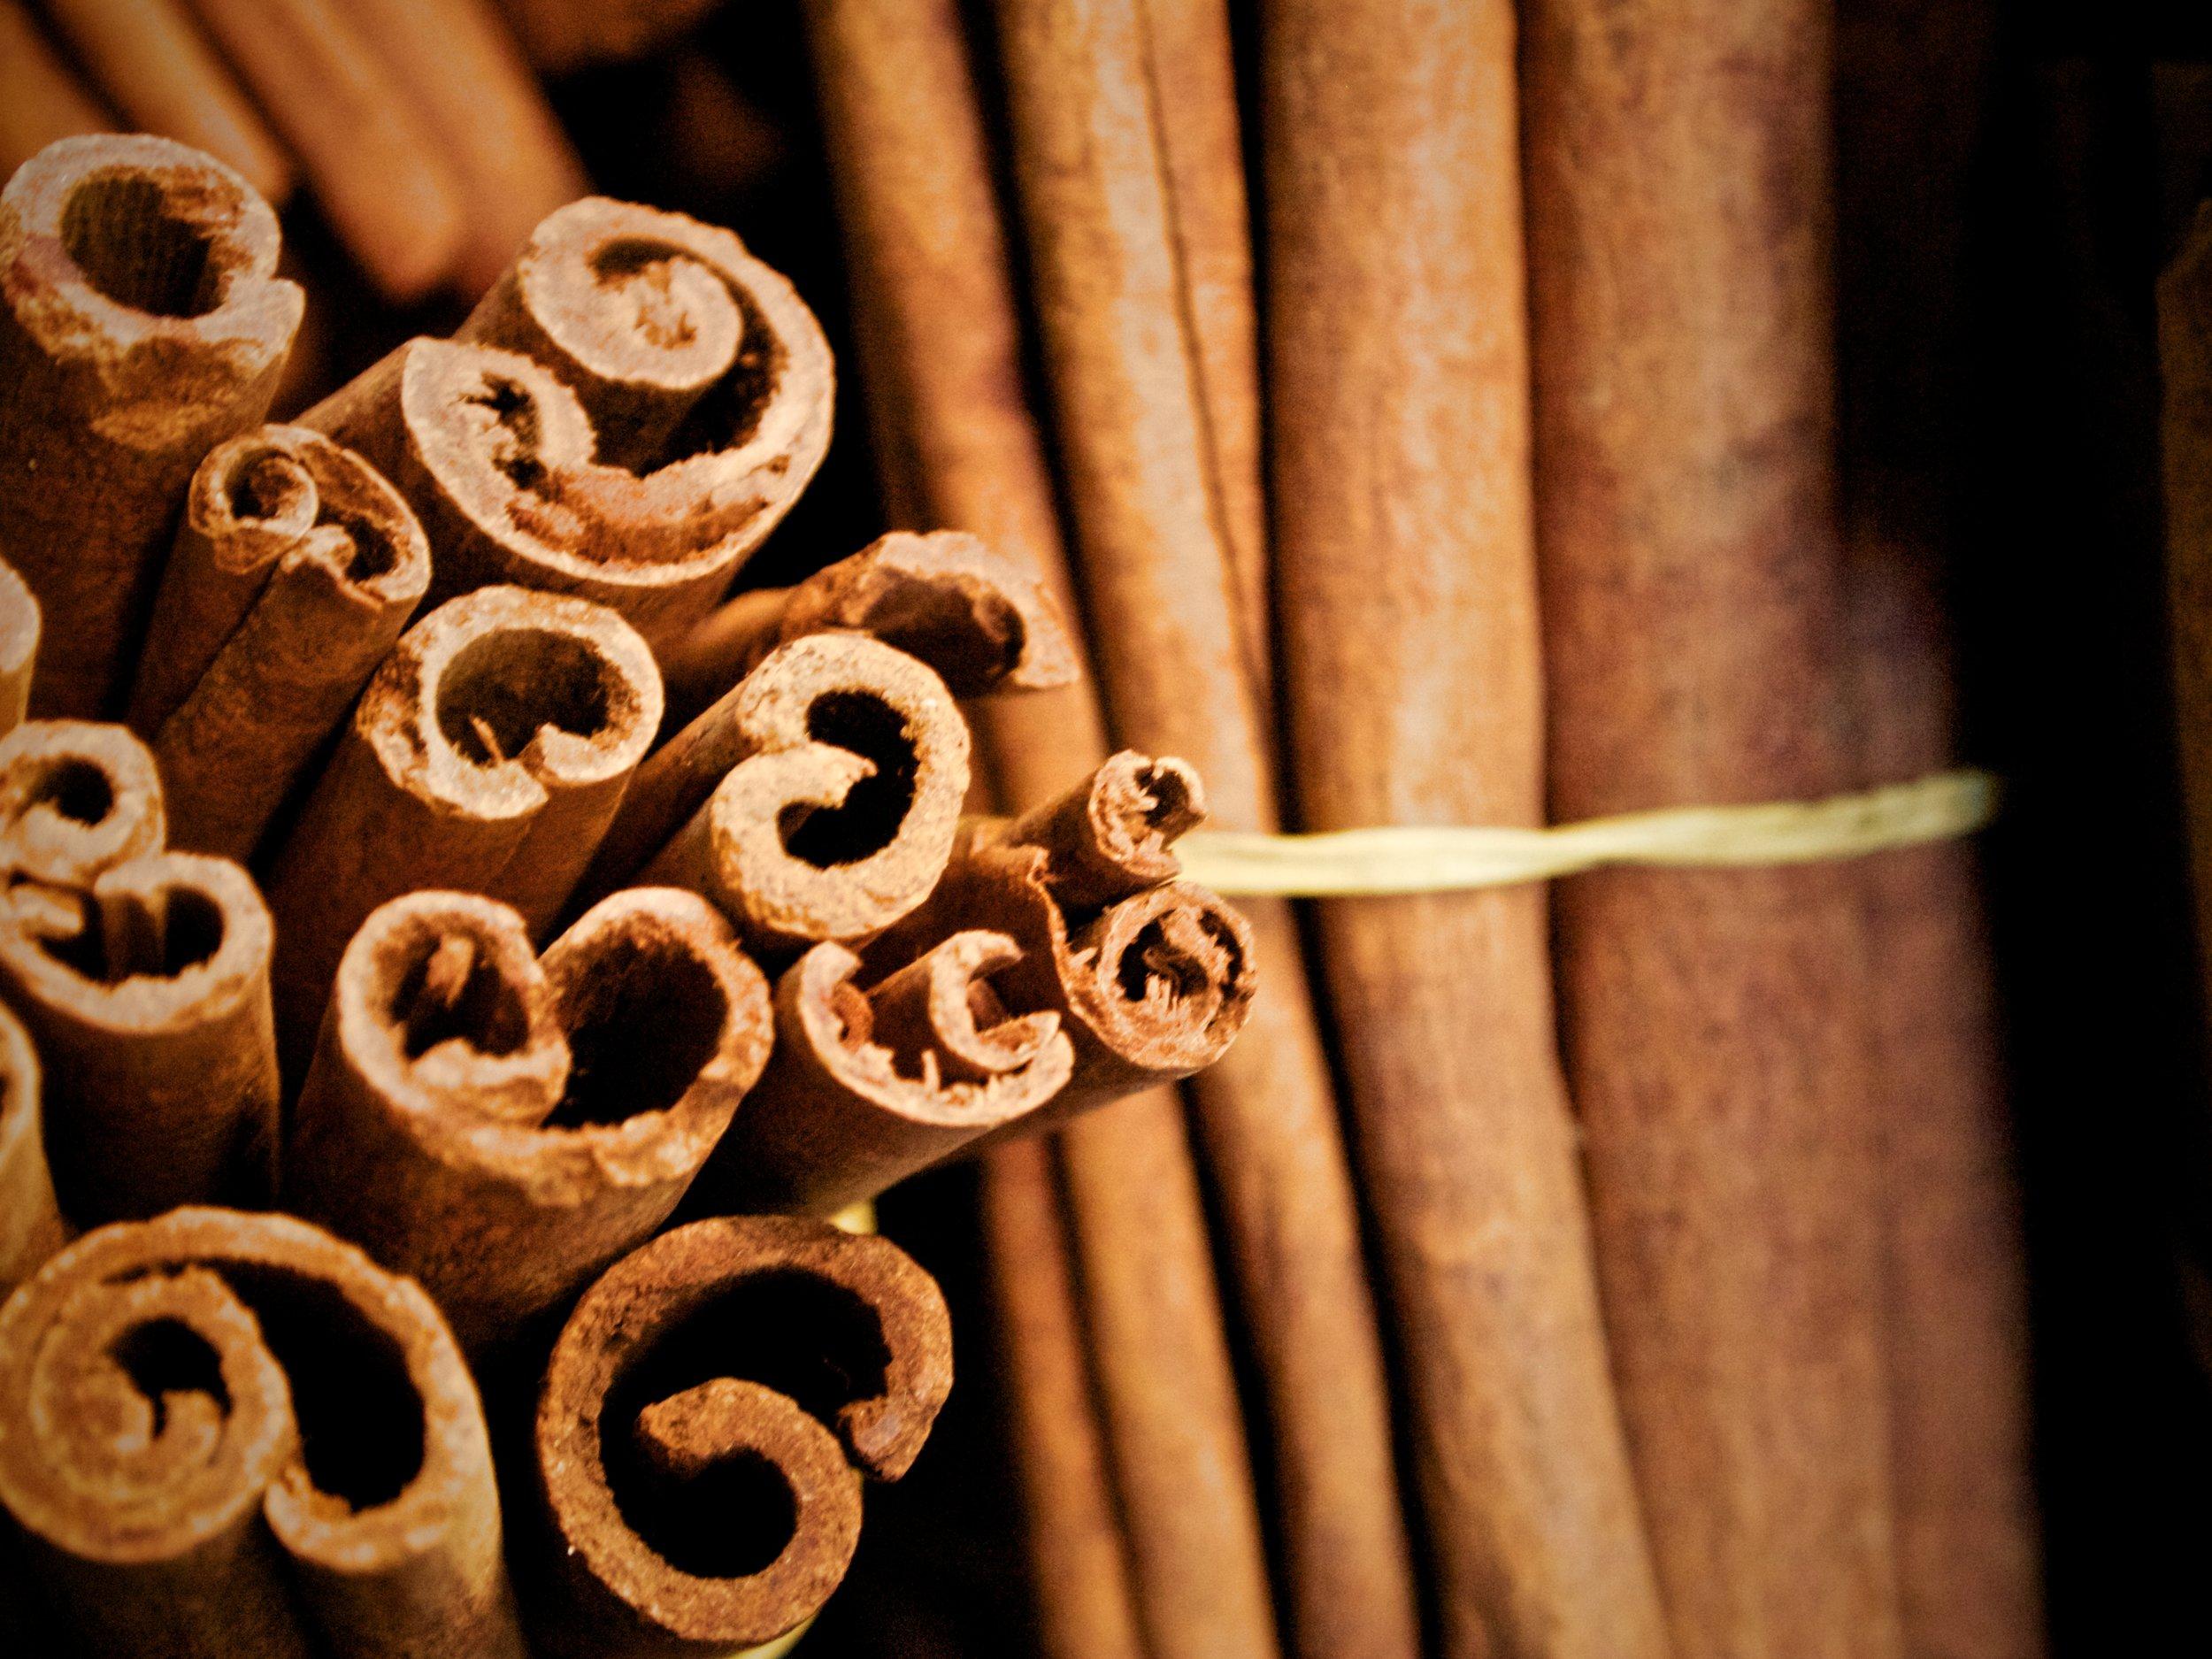 Then,cinnamon.